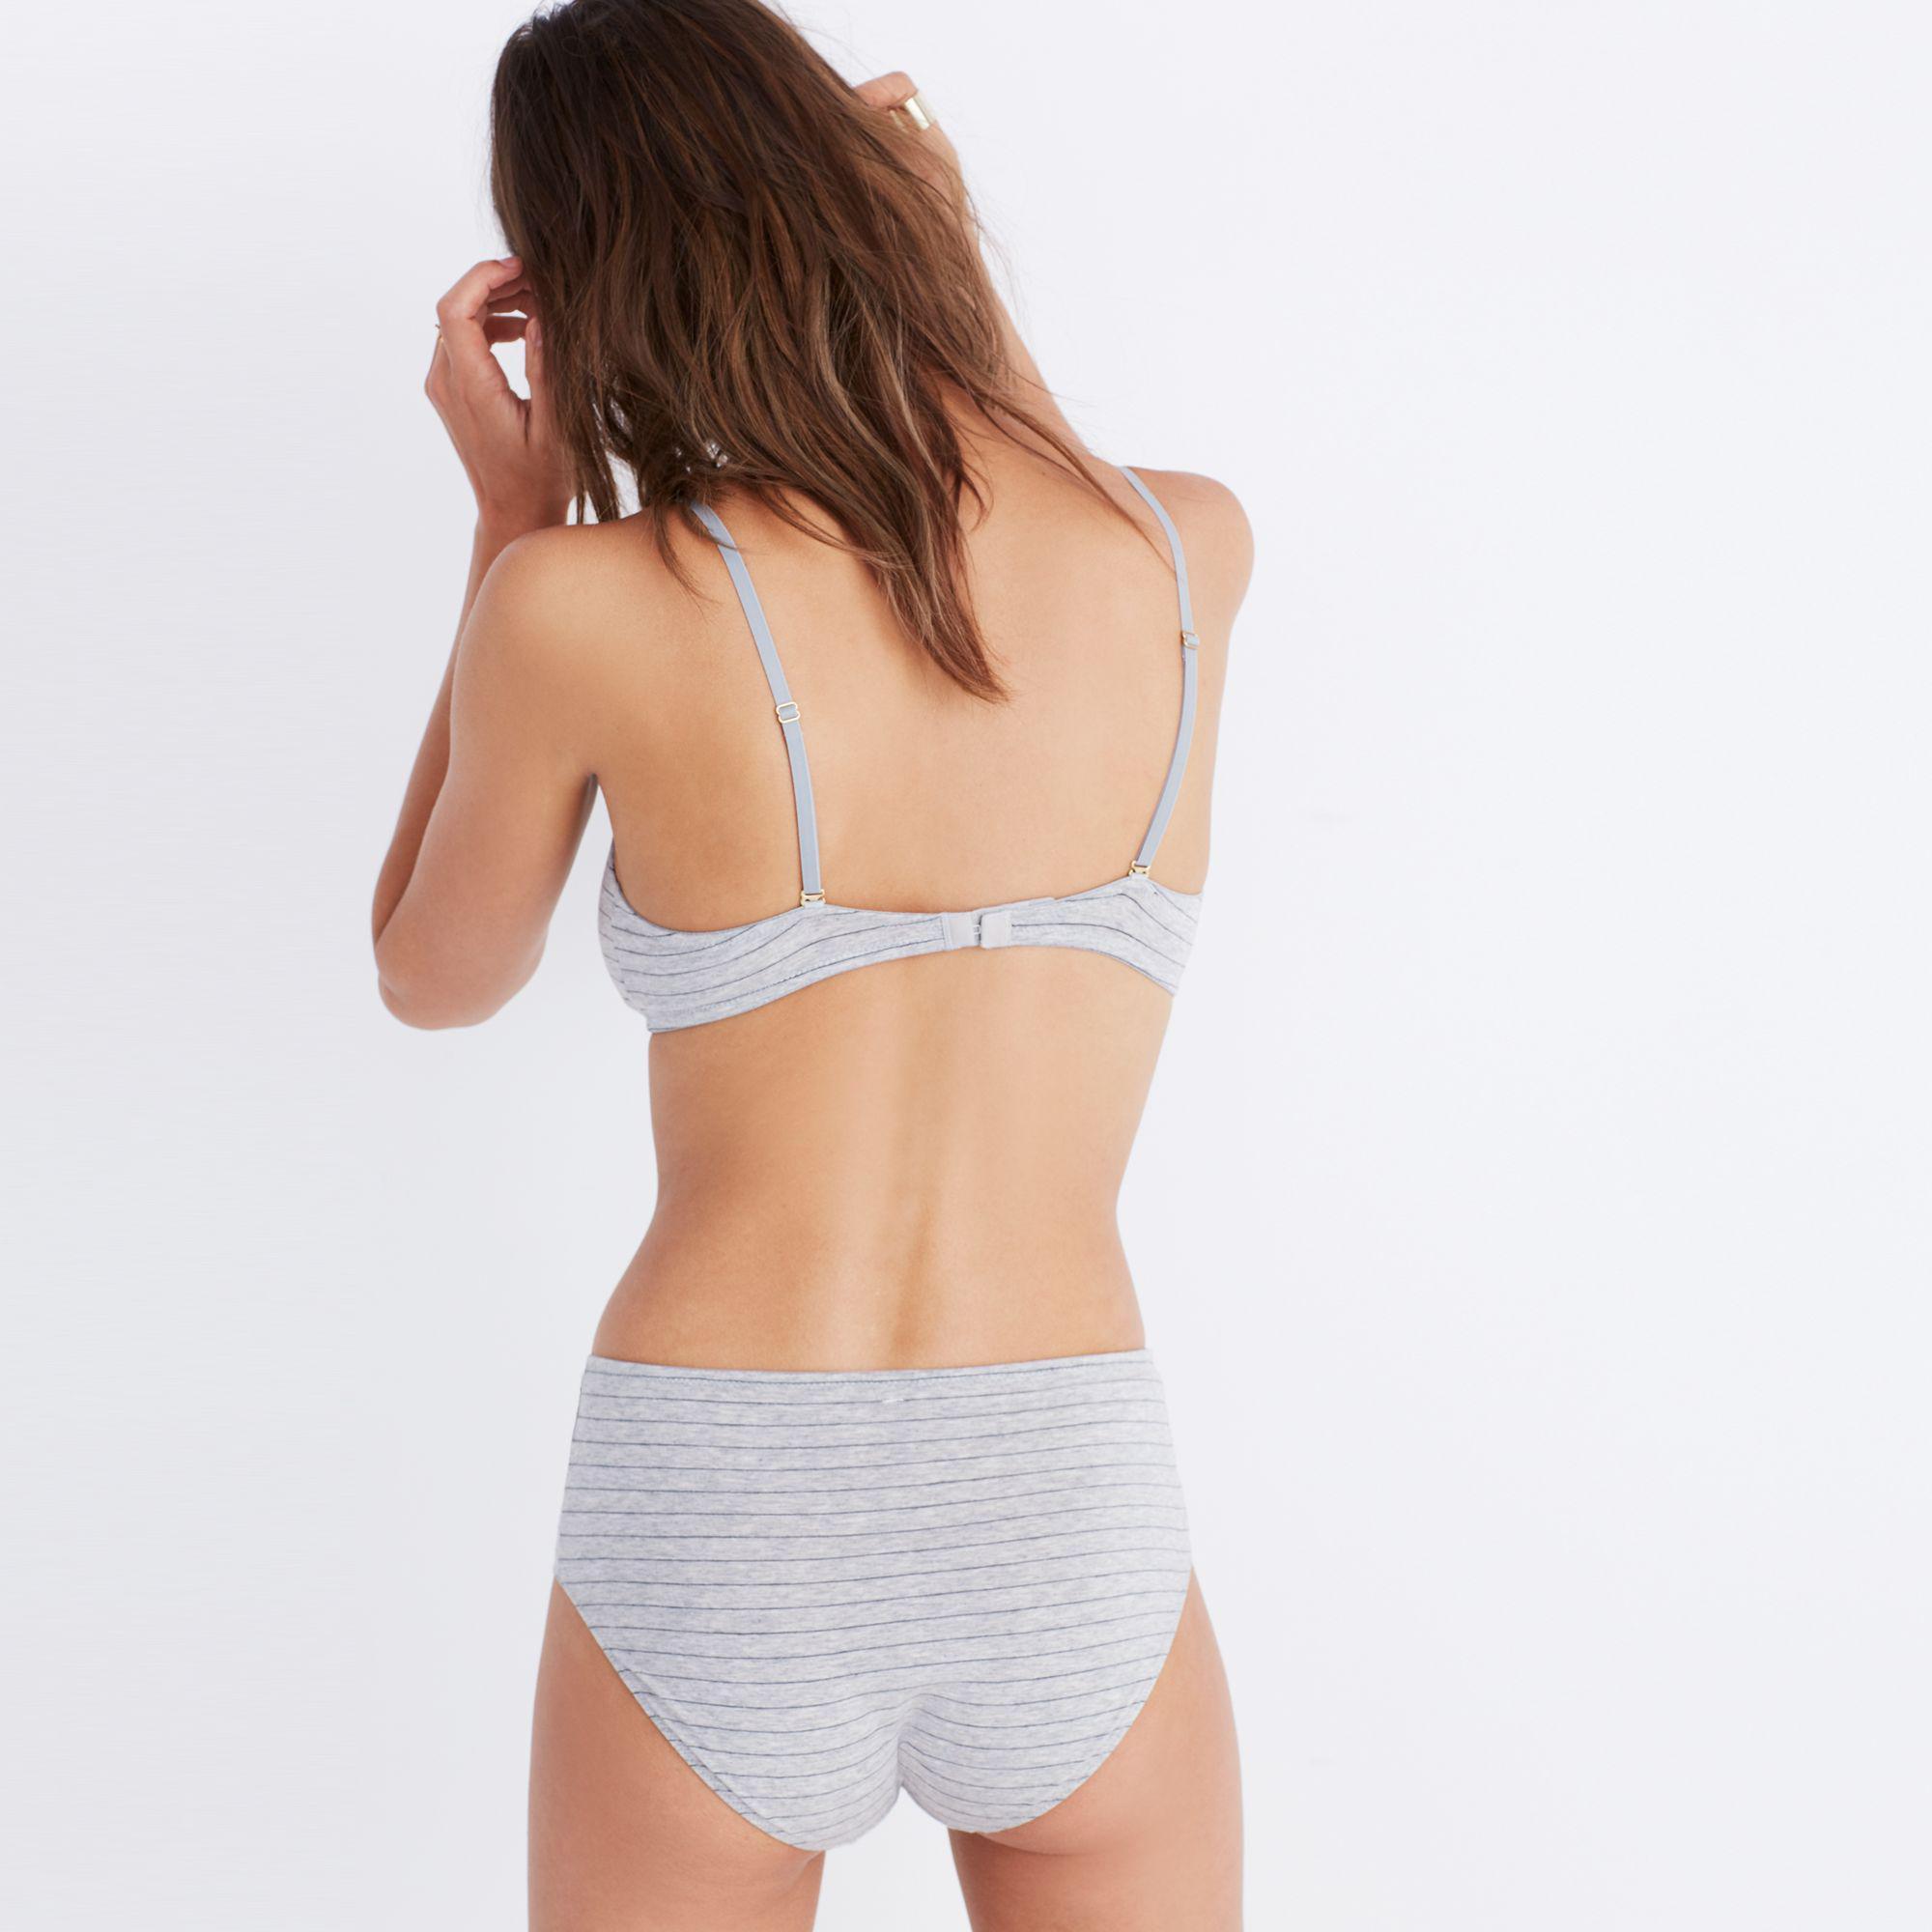 bbc2837580 Lyst - Madewell Cotton-modal® Mila Padded Bralette In Stripe